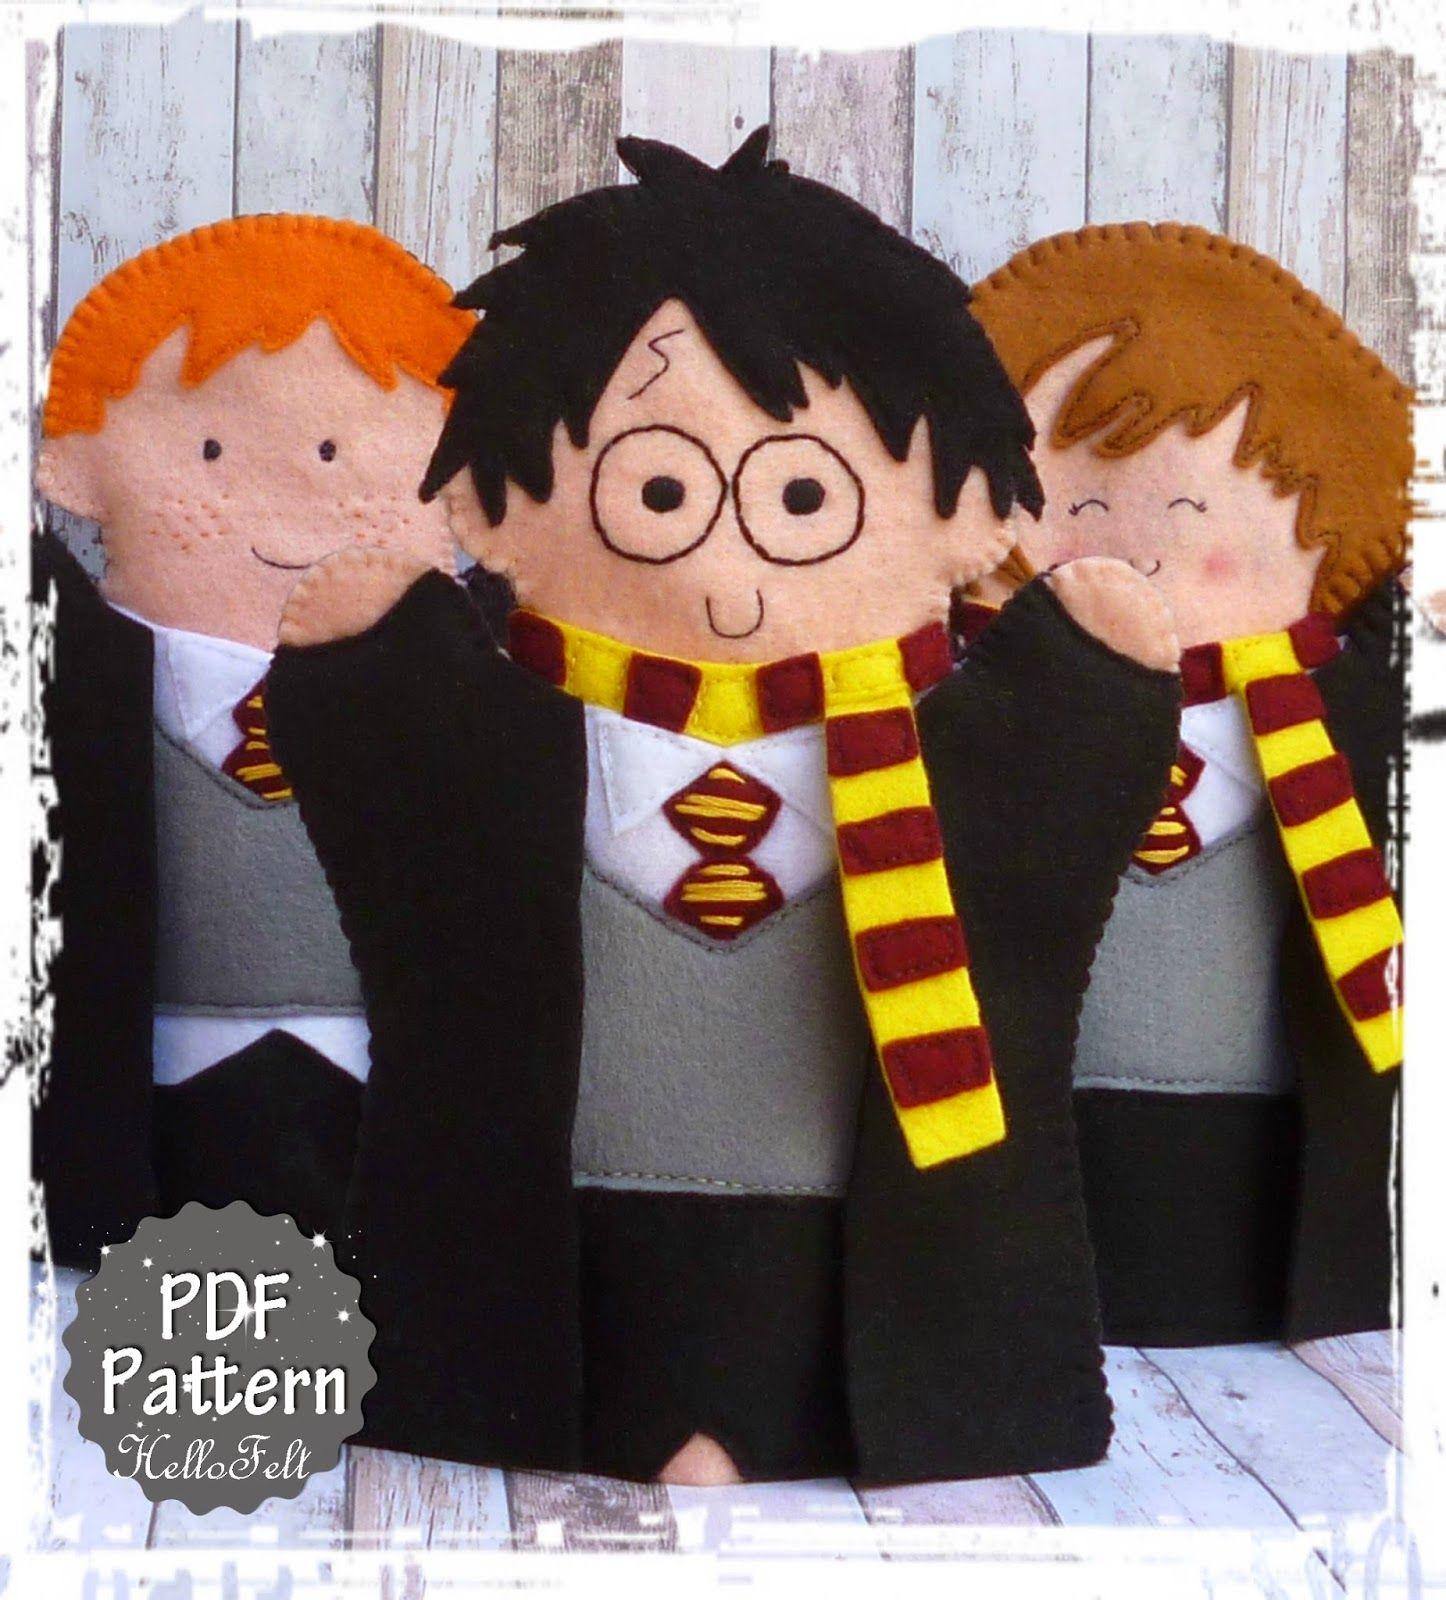 Harry Potter Muppets: Títeres Para Mano De Harry Potter / Harry Potter Hand